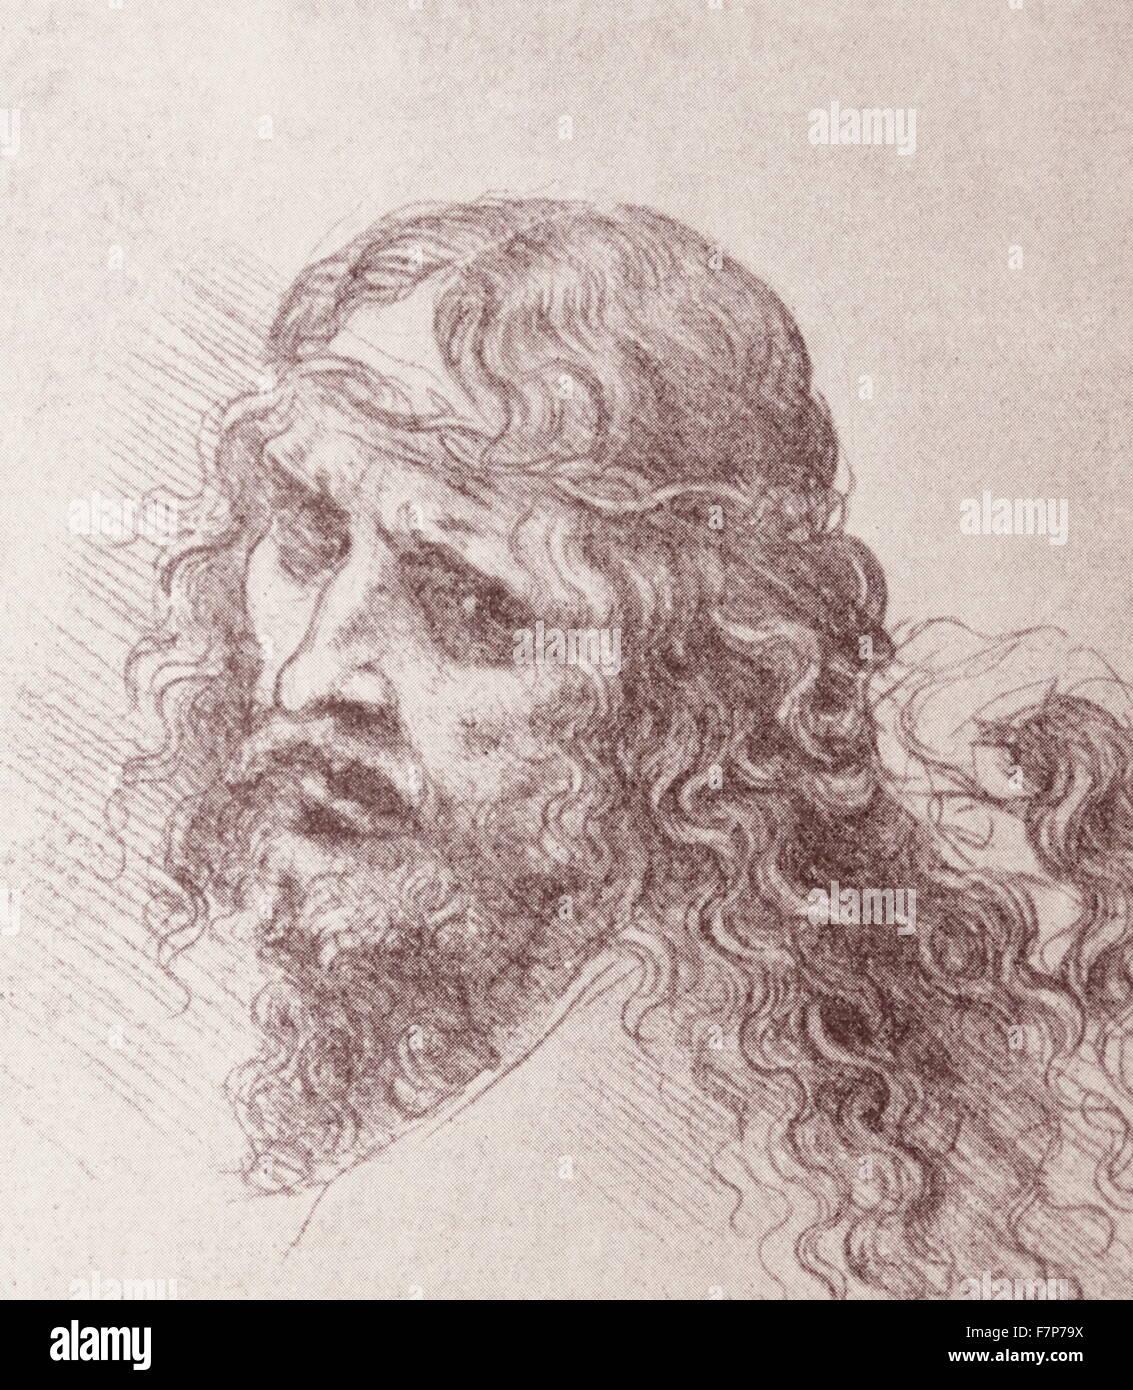 Christ, as imagined by Leonardo Da Vinci. - Stock Image